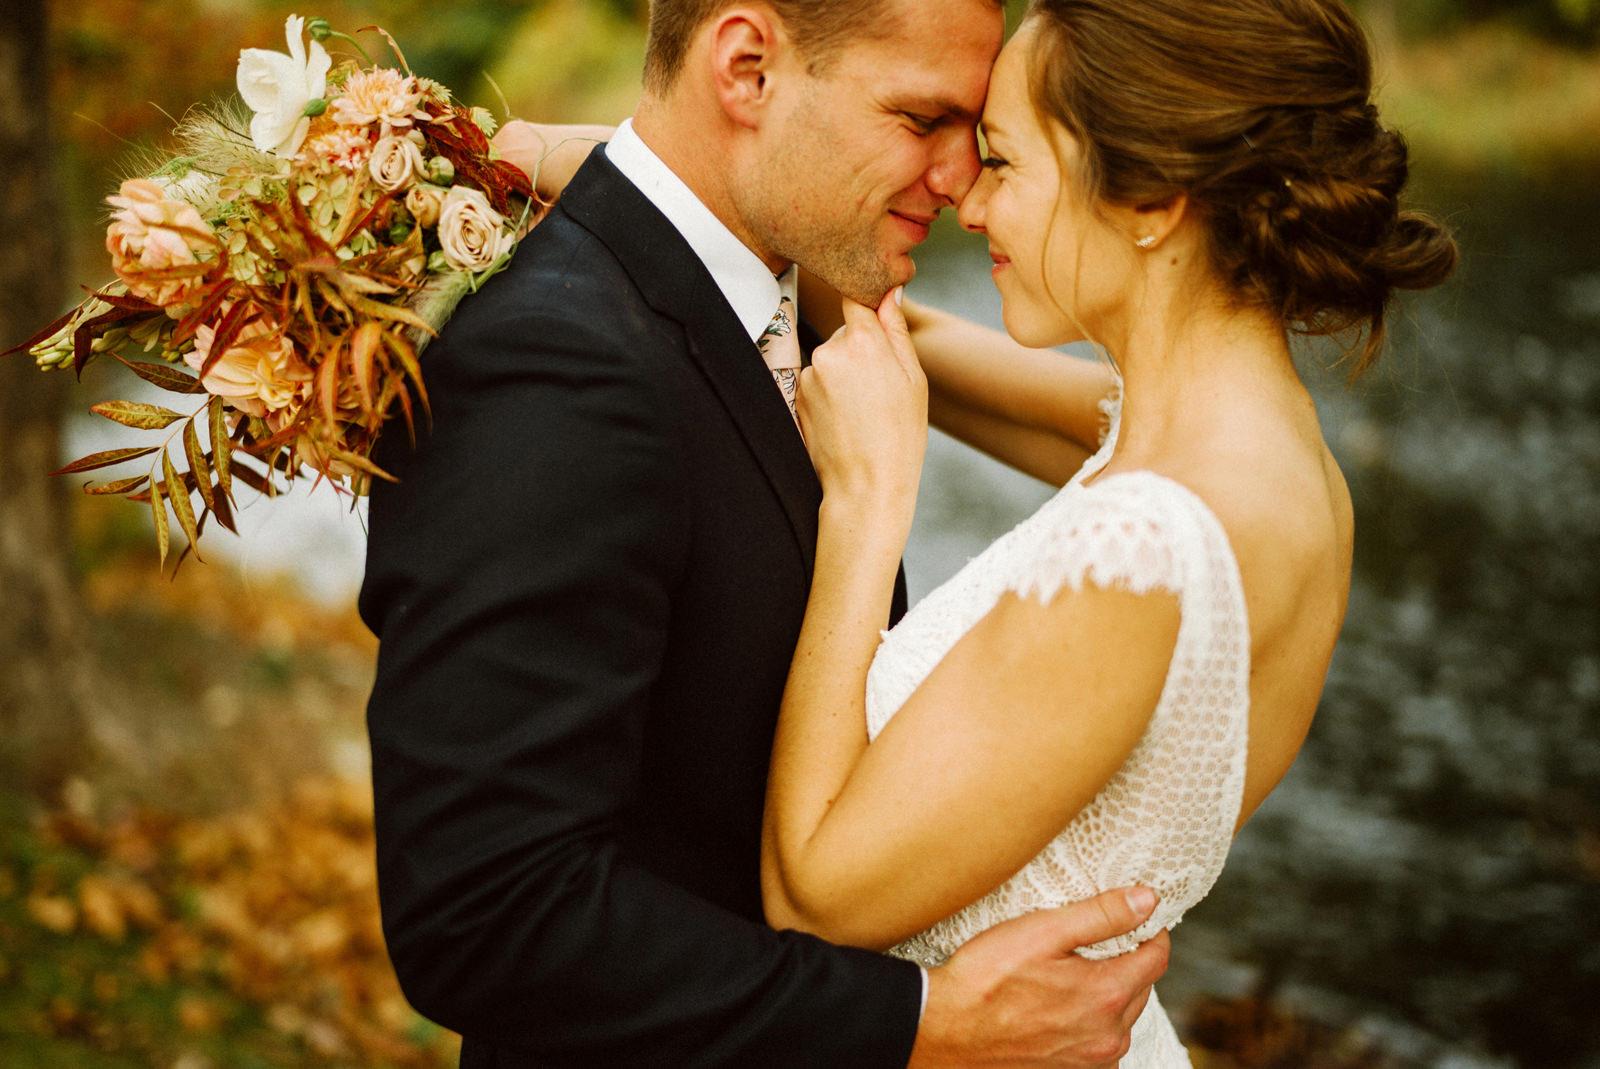 bridgeport-wedding-114 BRIDGEPORT, CONNECTICUT BACKYARD WEDDING